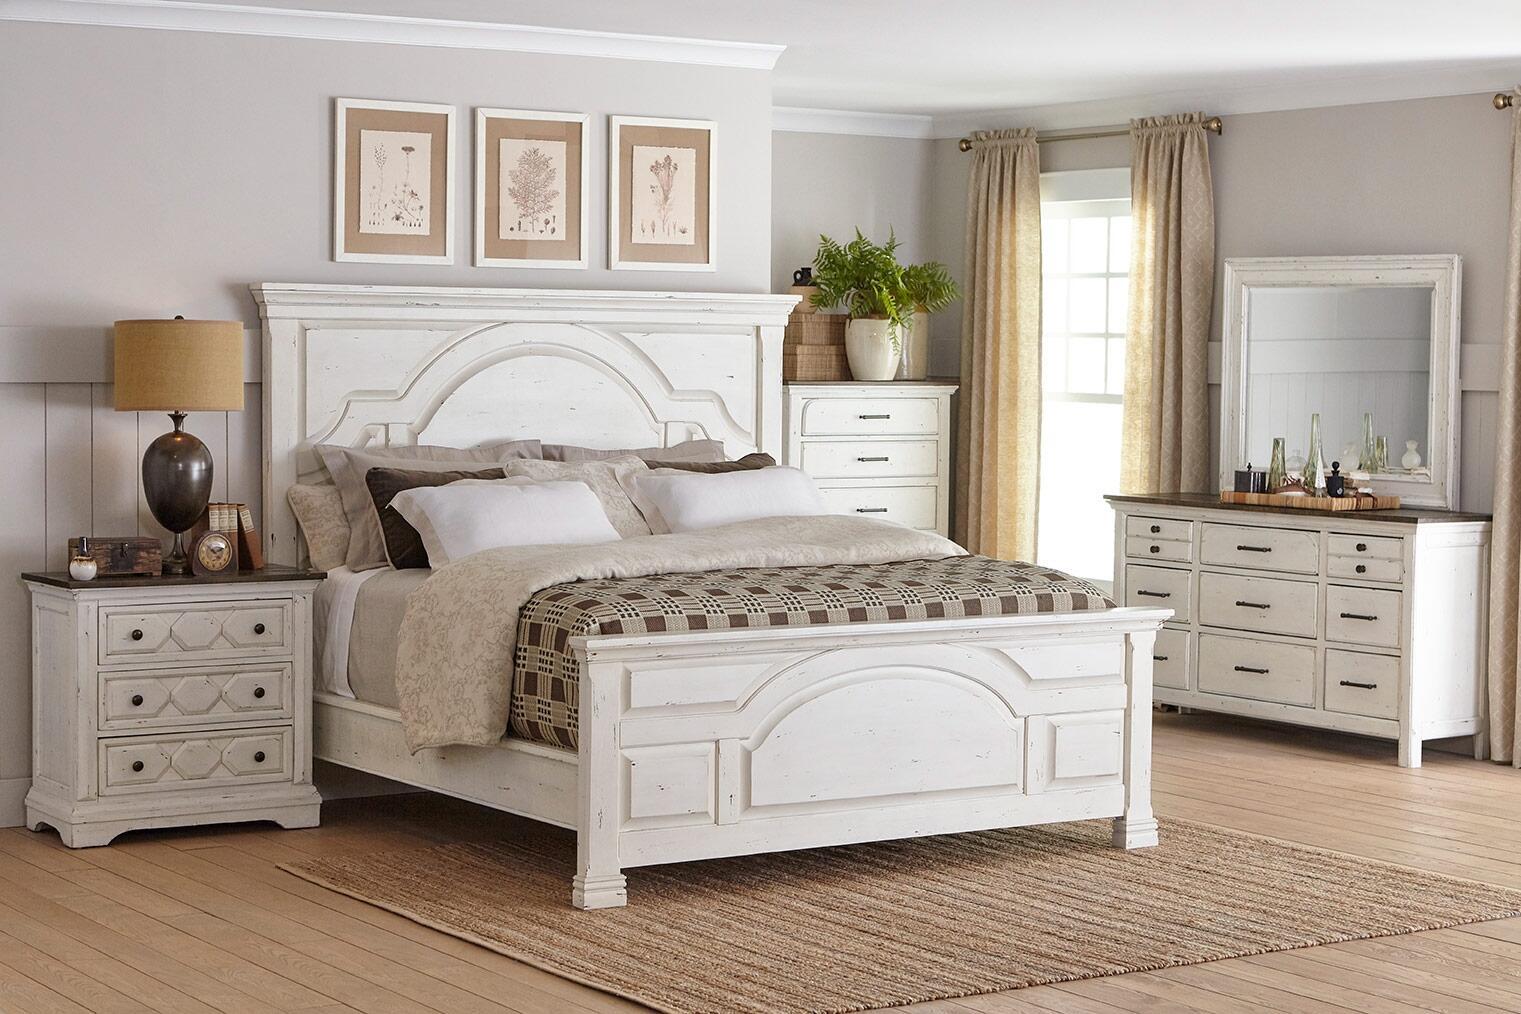 Coaster 206461KES5 Celeste King Bedroom Sets | Appliances Connection